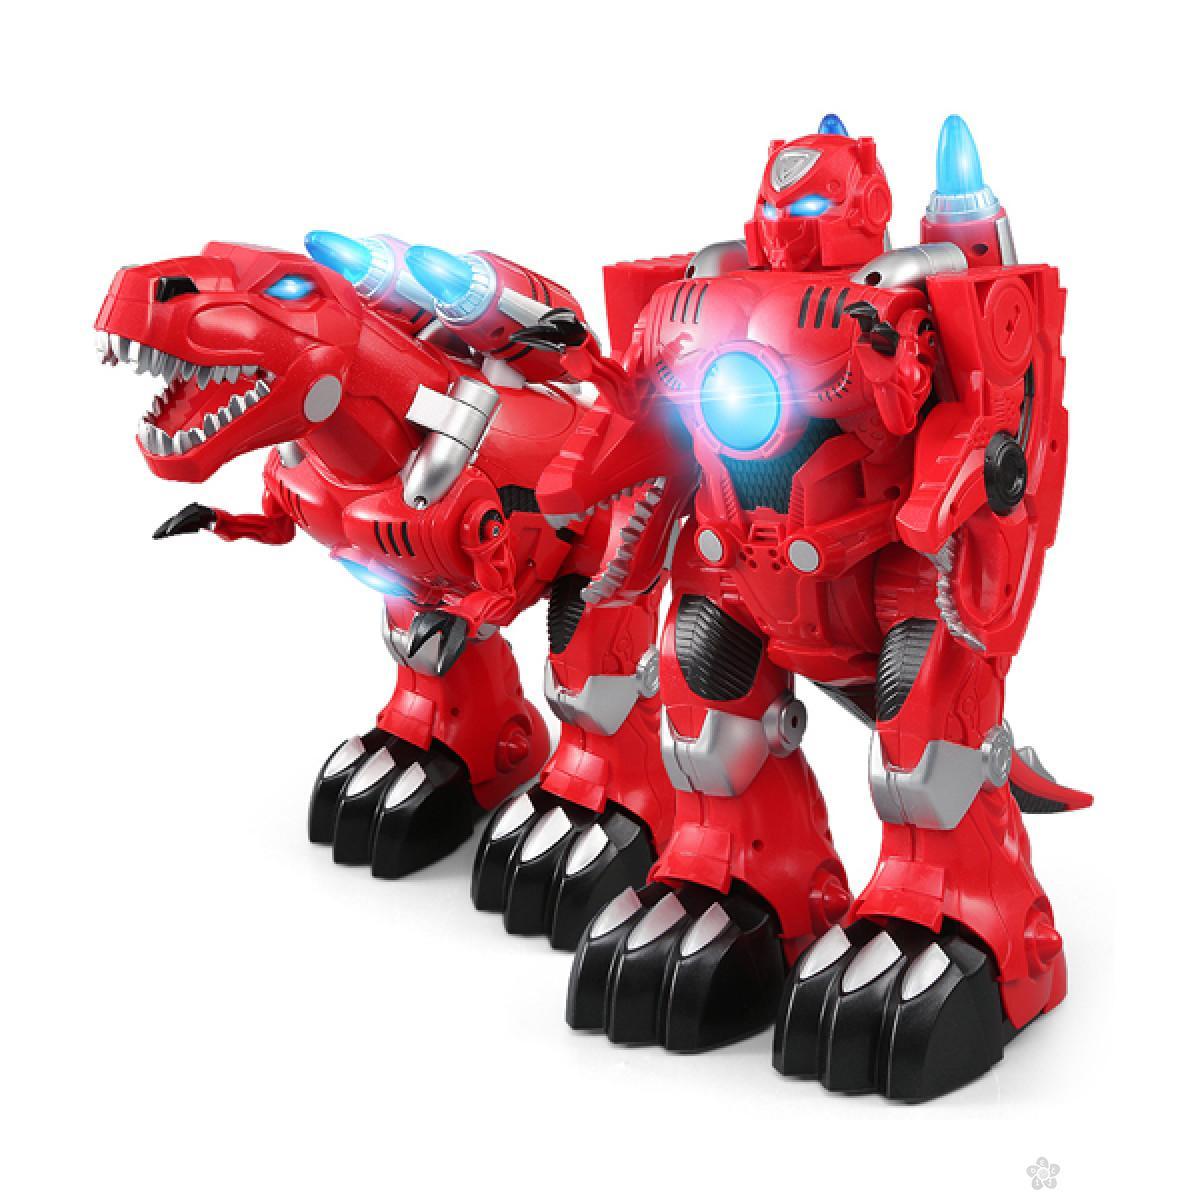 Dino transformers, 100324